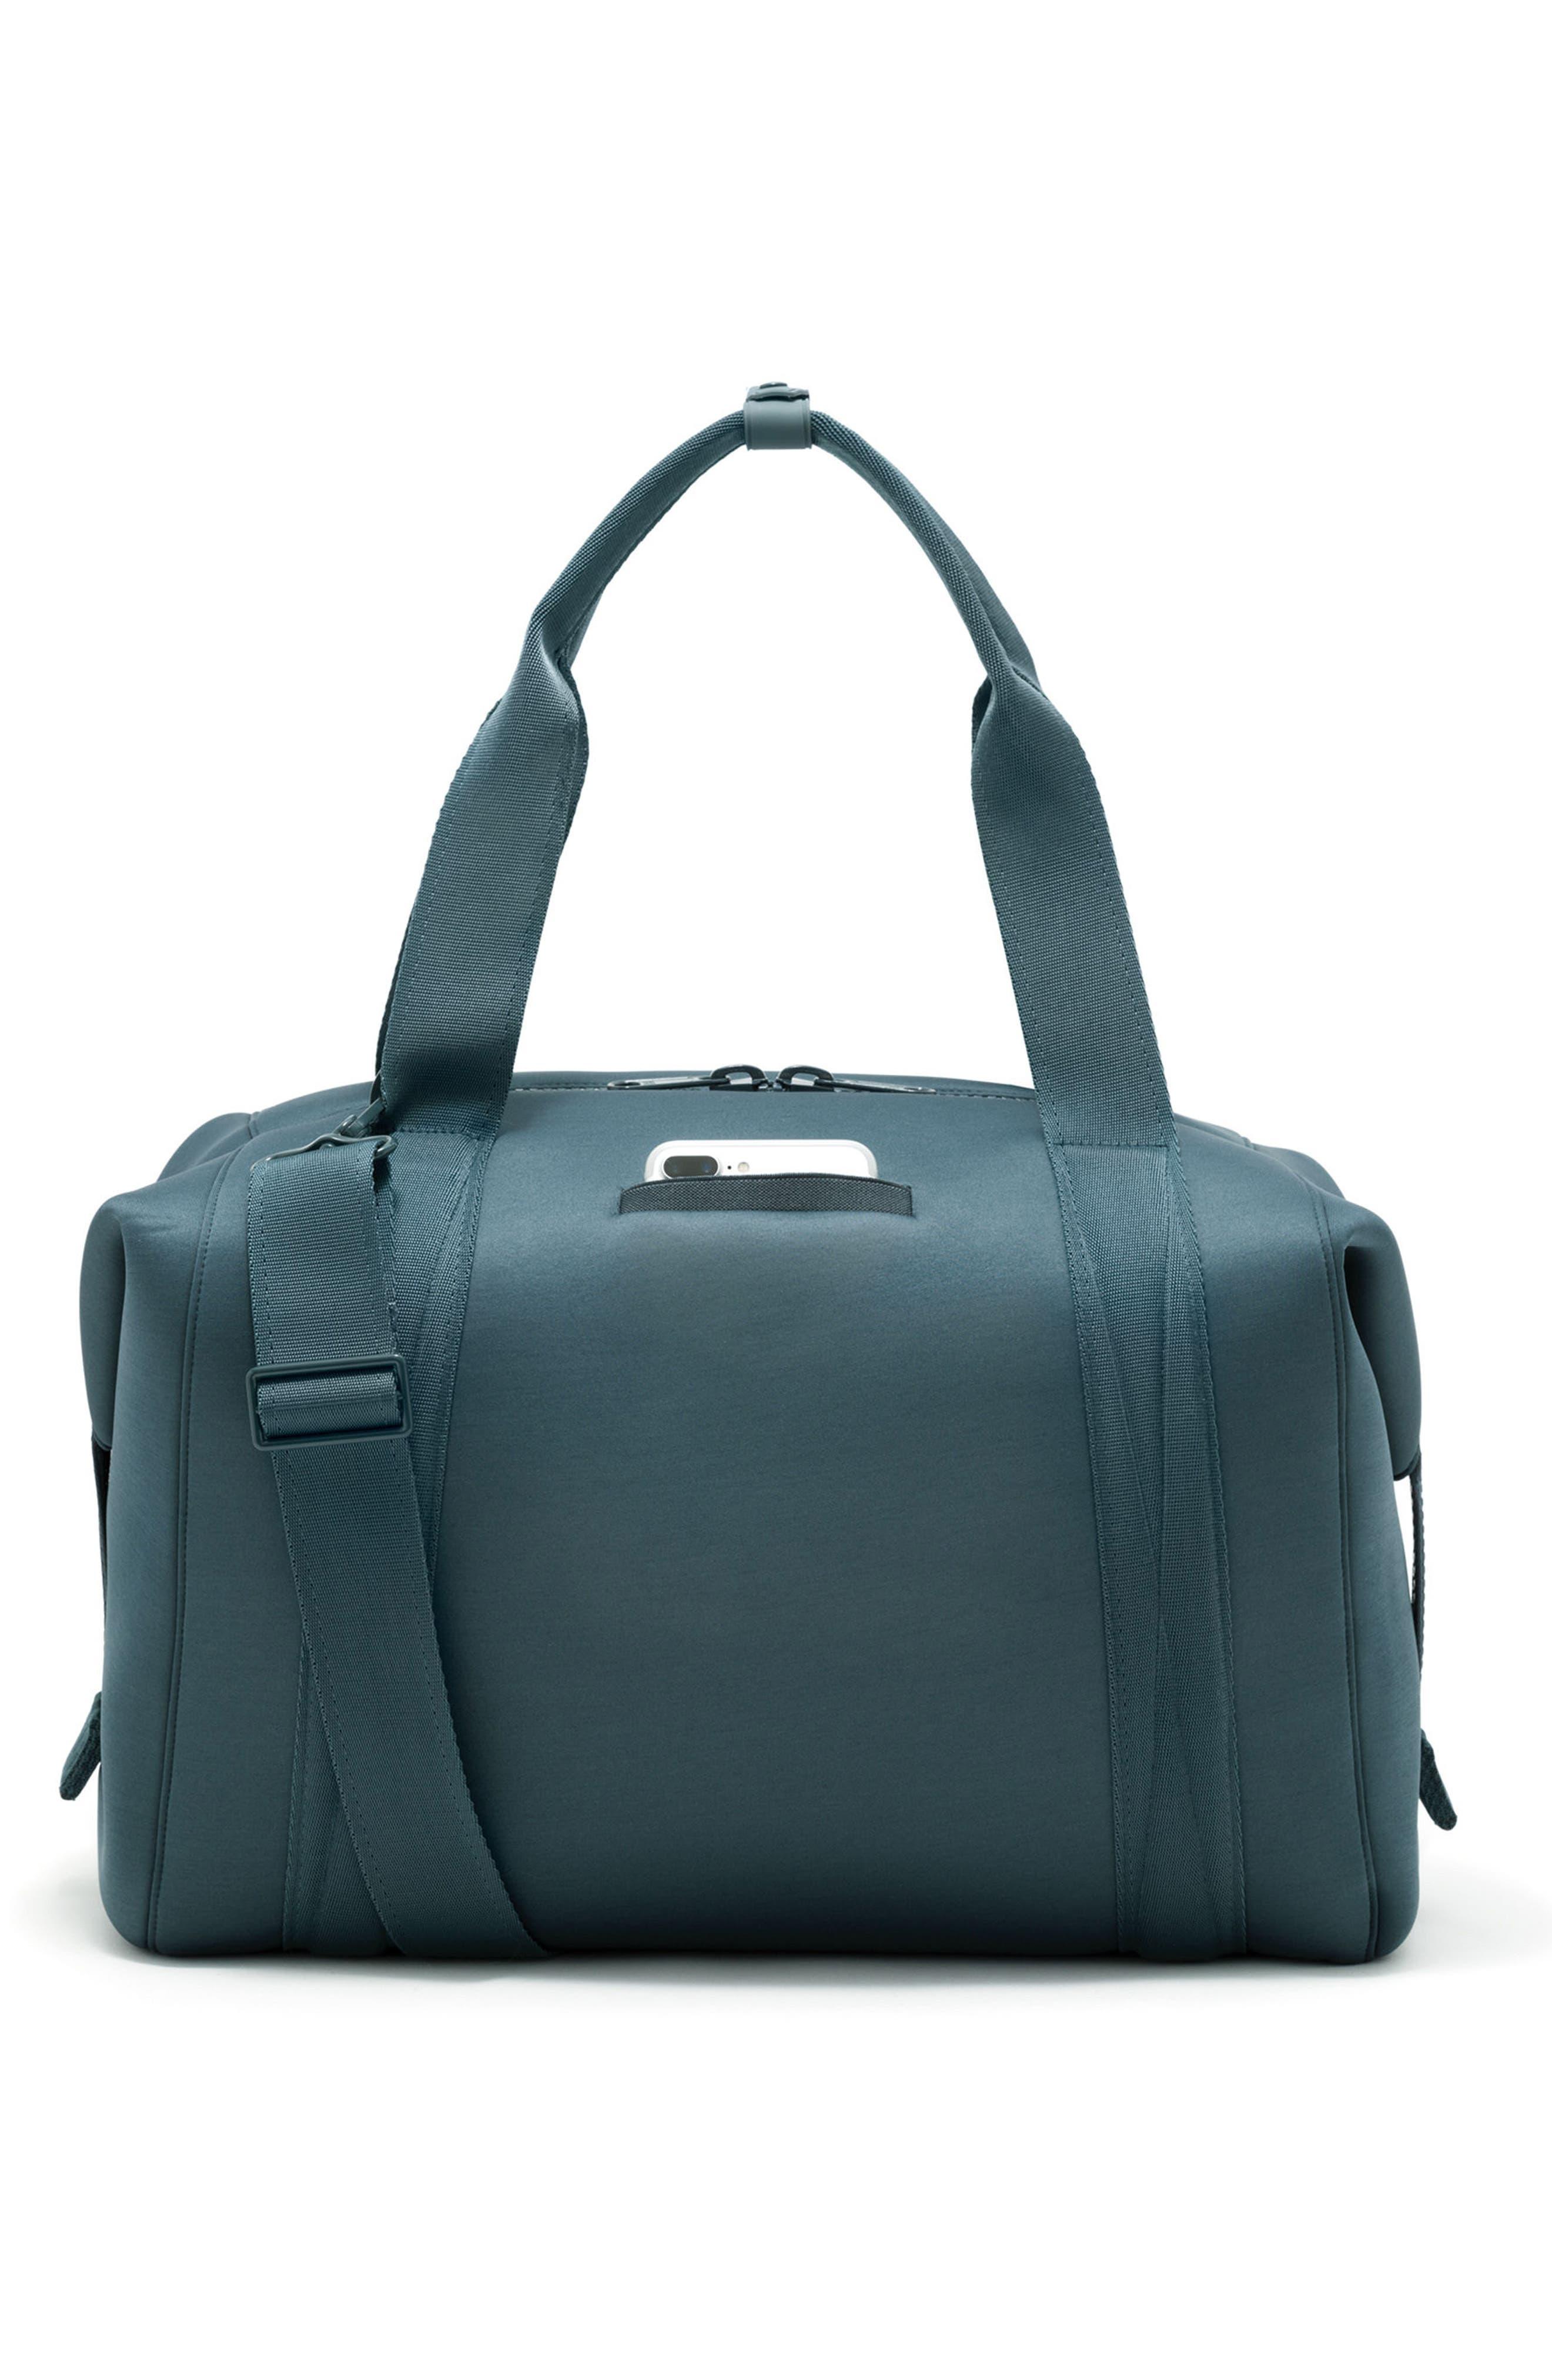 365 Large Landon Neoprene Carryall Duffel Bag,                             Alternate thumbnail 29, color,